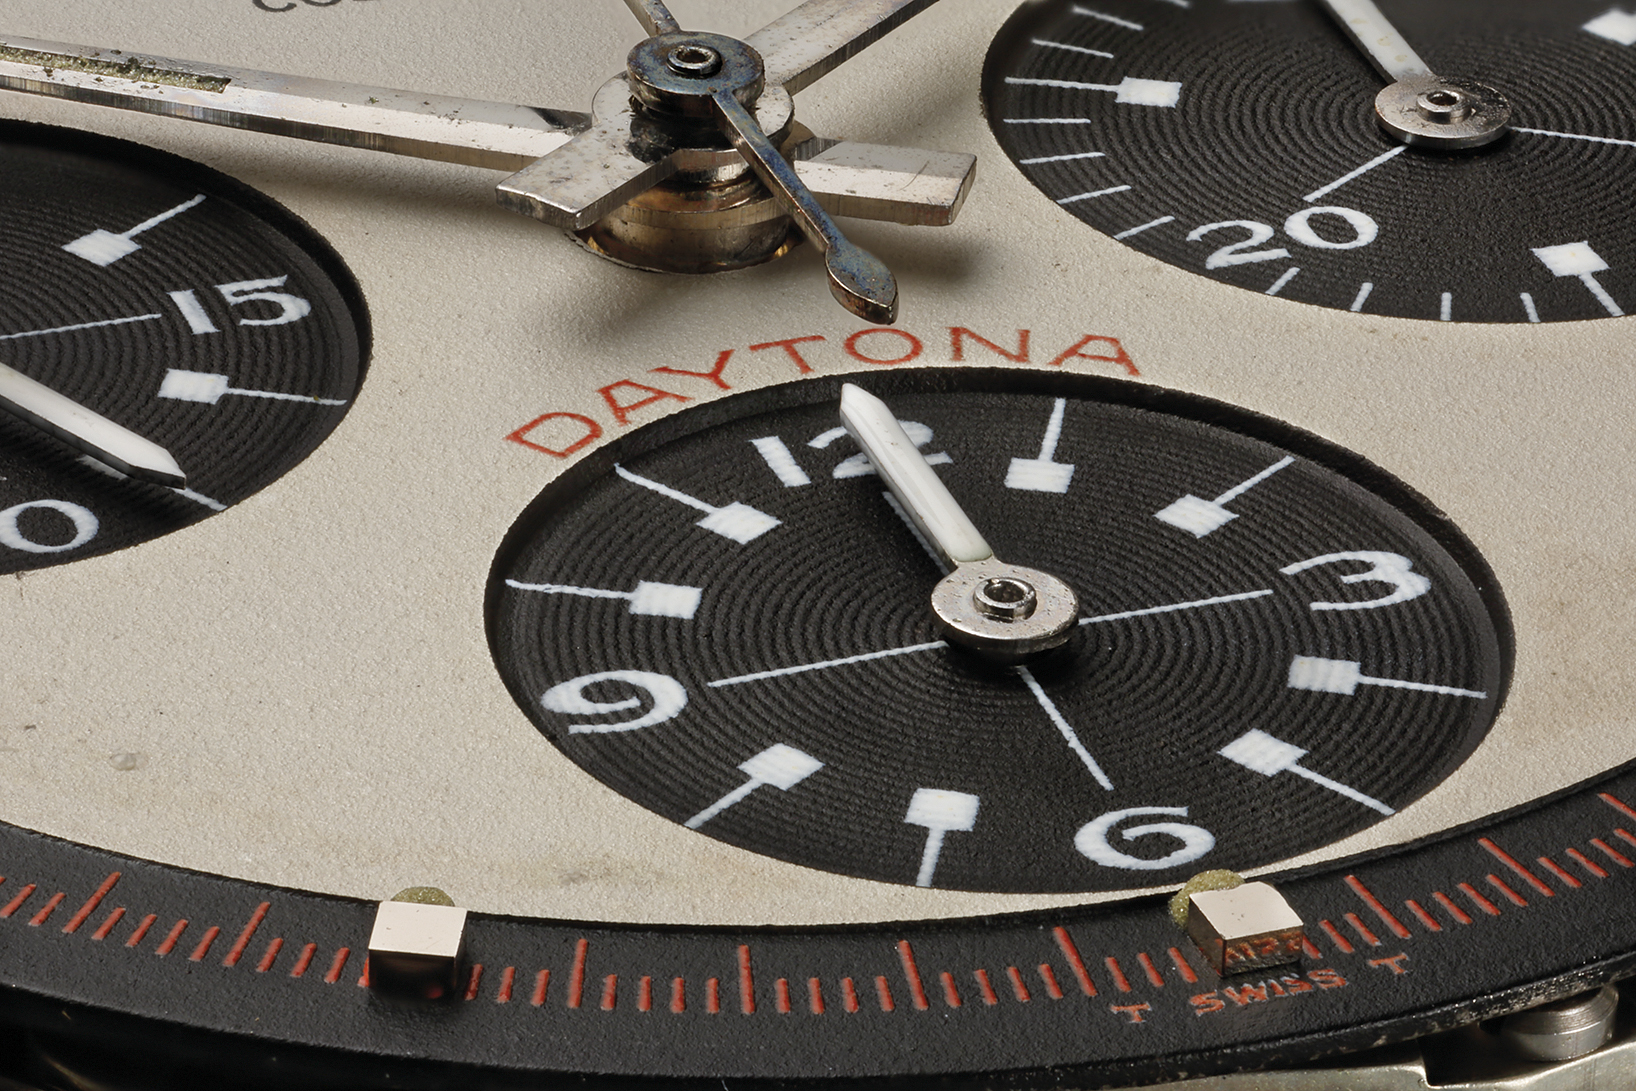 World record at auction Paul Newman Rolex Daytona